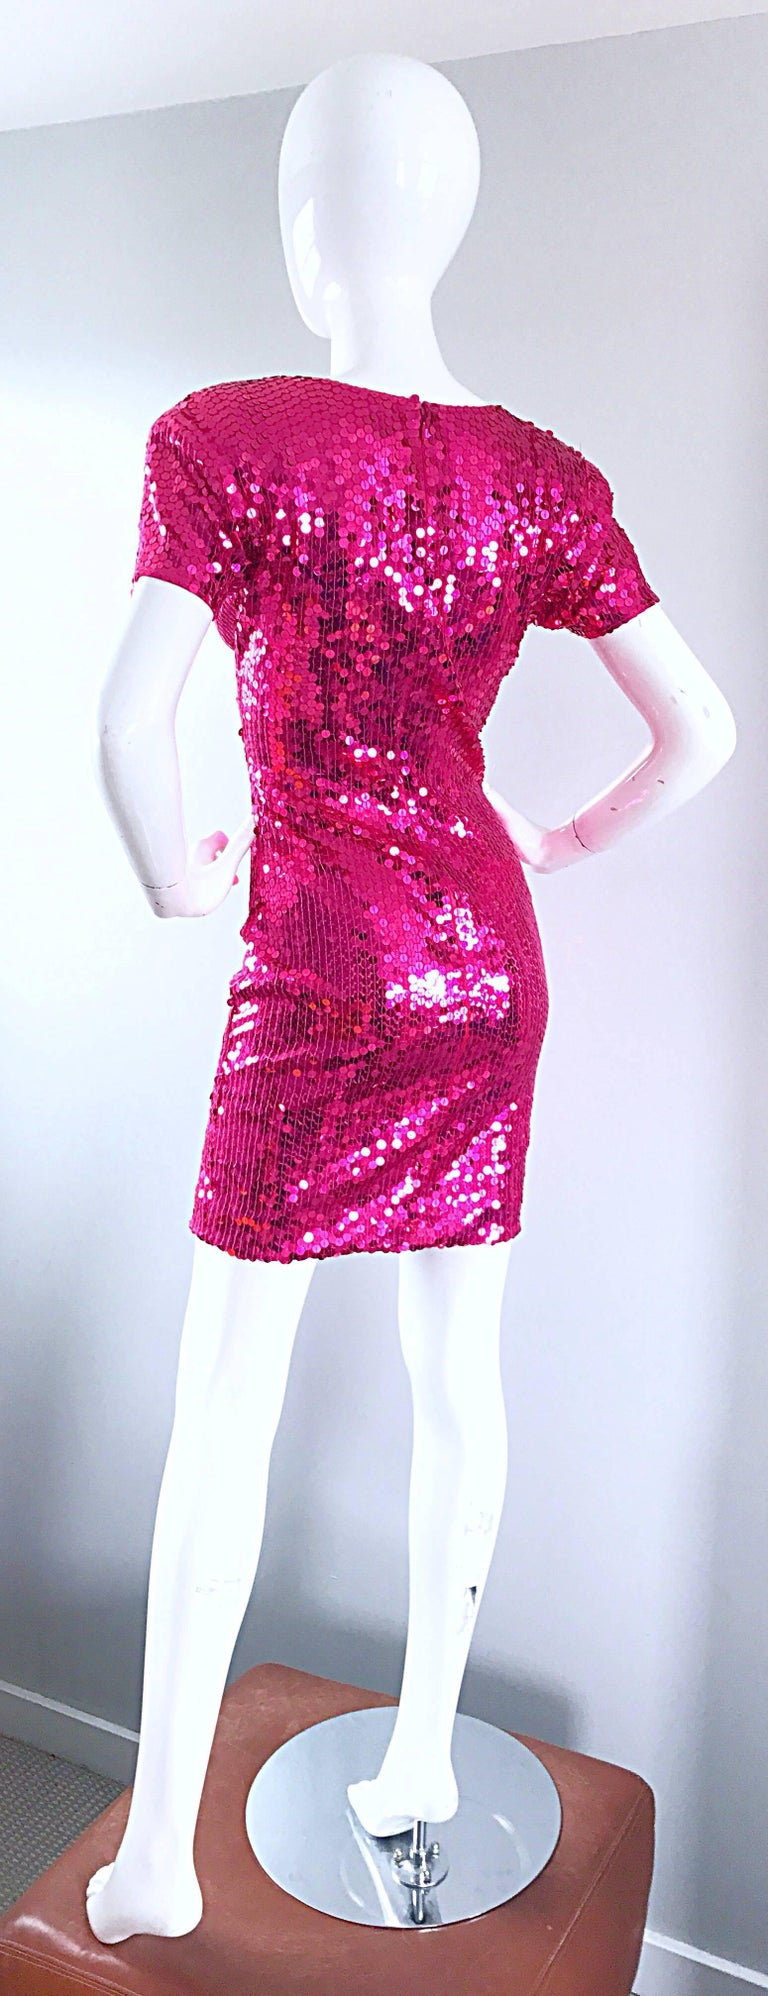 68 UK 1990s Confetti Sequin Micro Mini Size 24 US European Vintage Sleeveless Multicolor Rainbow Metallic Bodycon Dress or Top